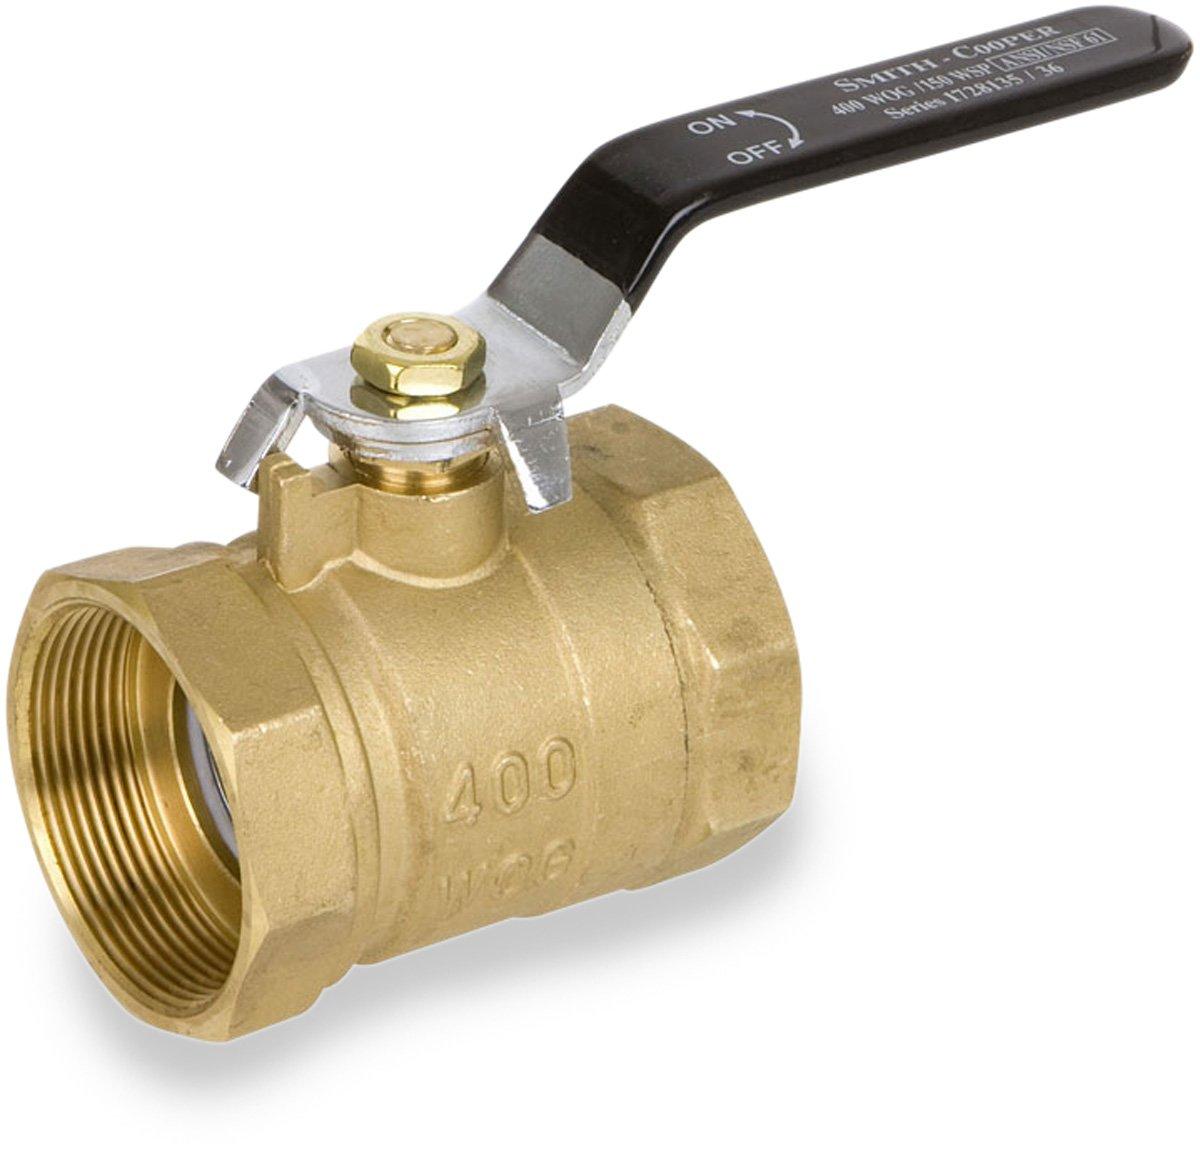 WOG IPS NPT Female Connector Lead-Free Brass Smith-Cooper International 01728135CL 1//4 NSF Standard Port Ball Valve 400 lb